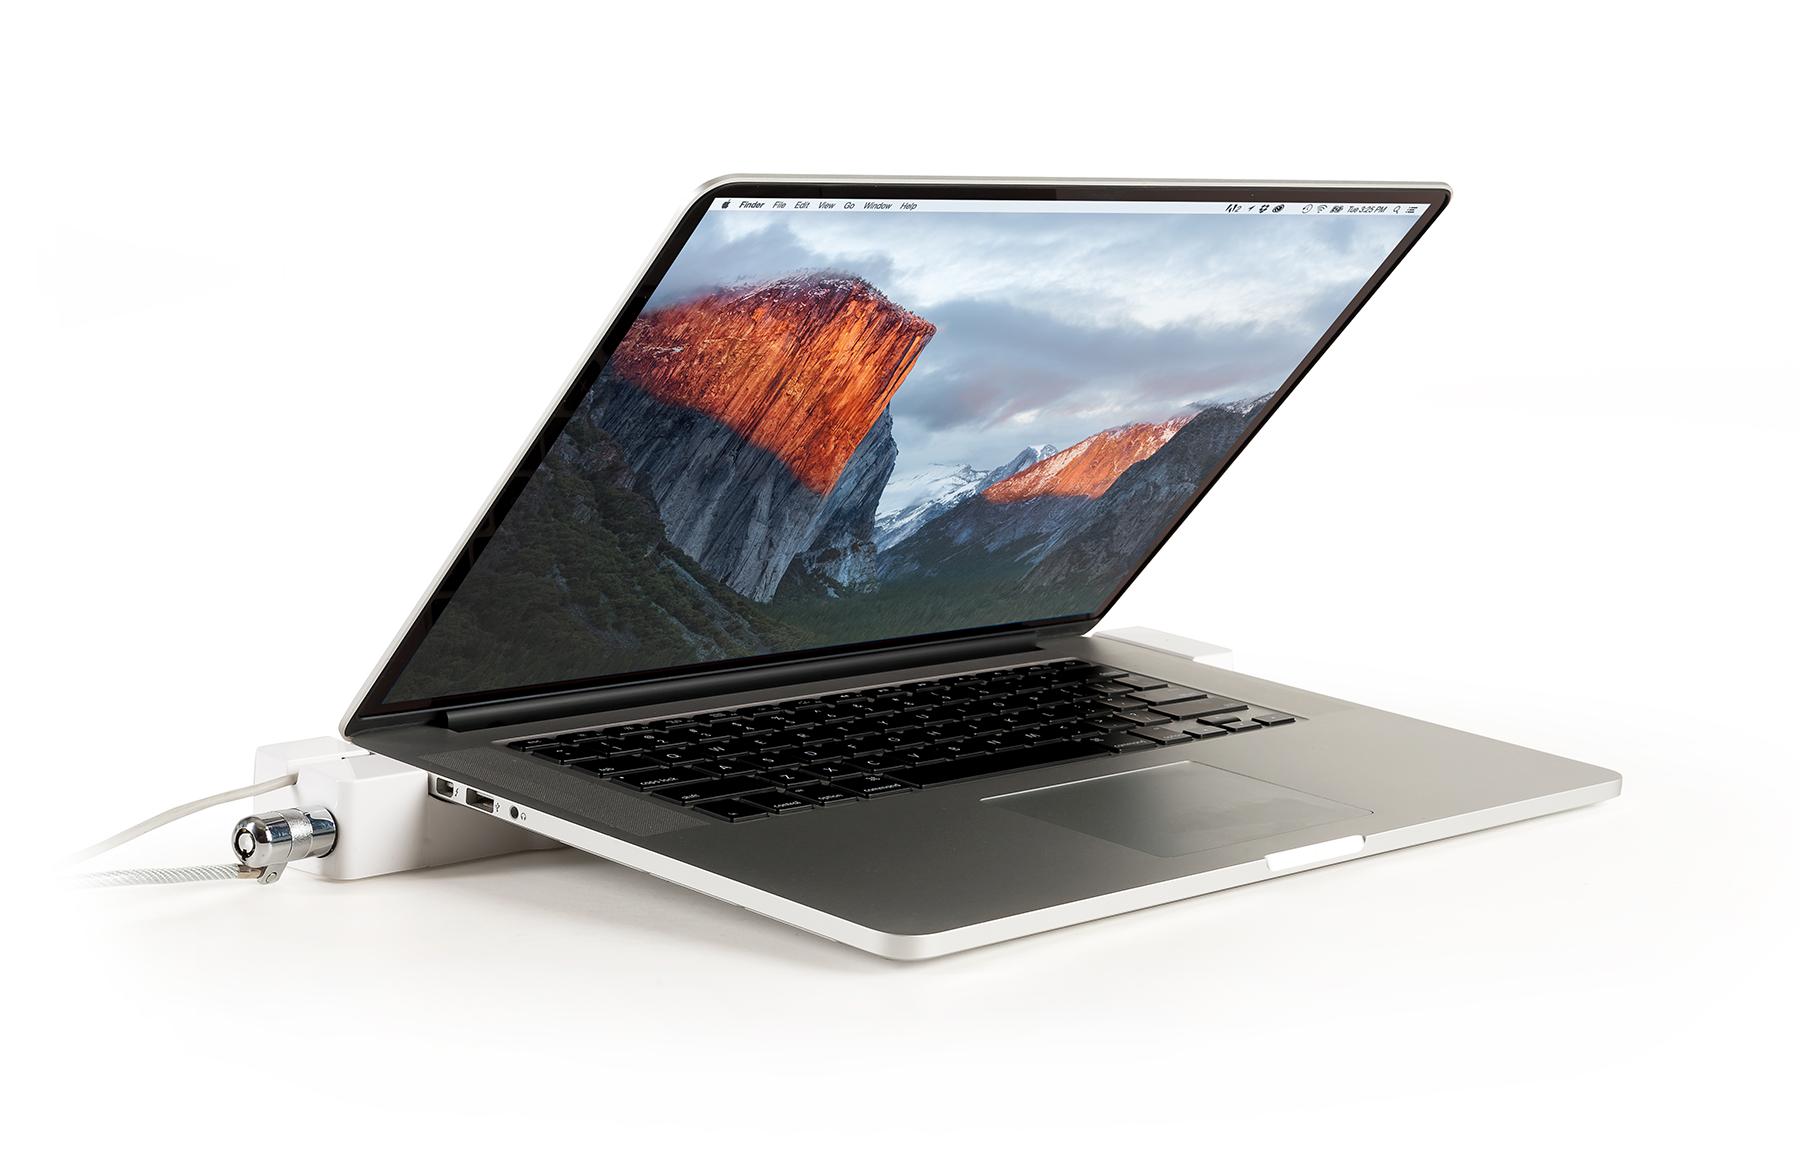 LandingZone DOCK for the MacBook Pro with Retina display